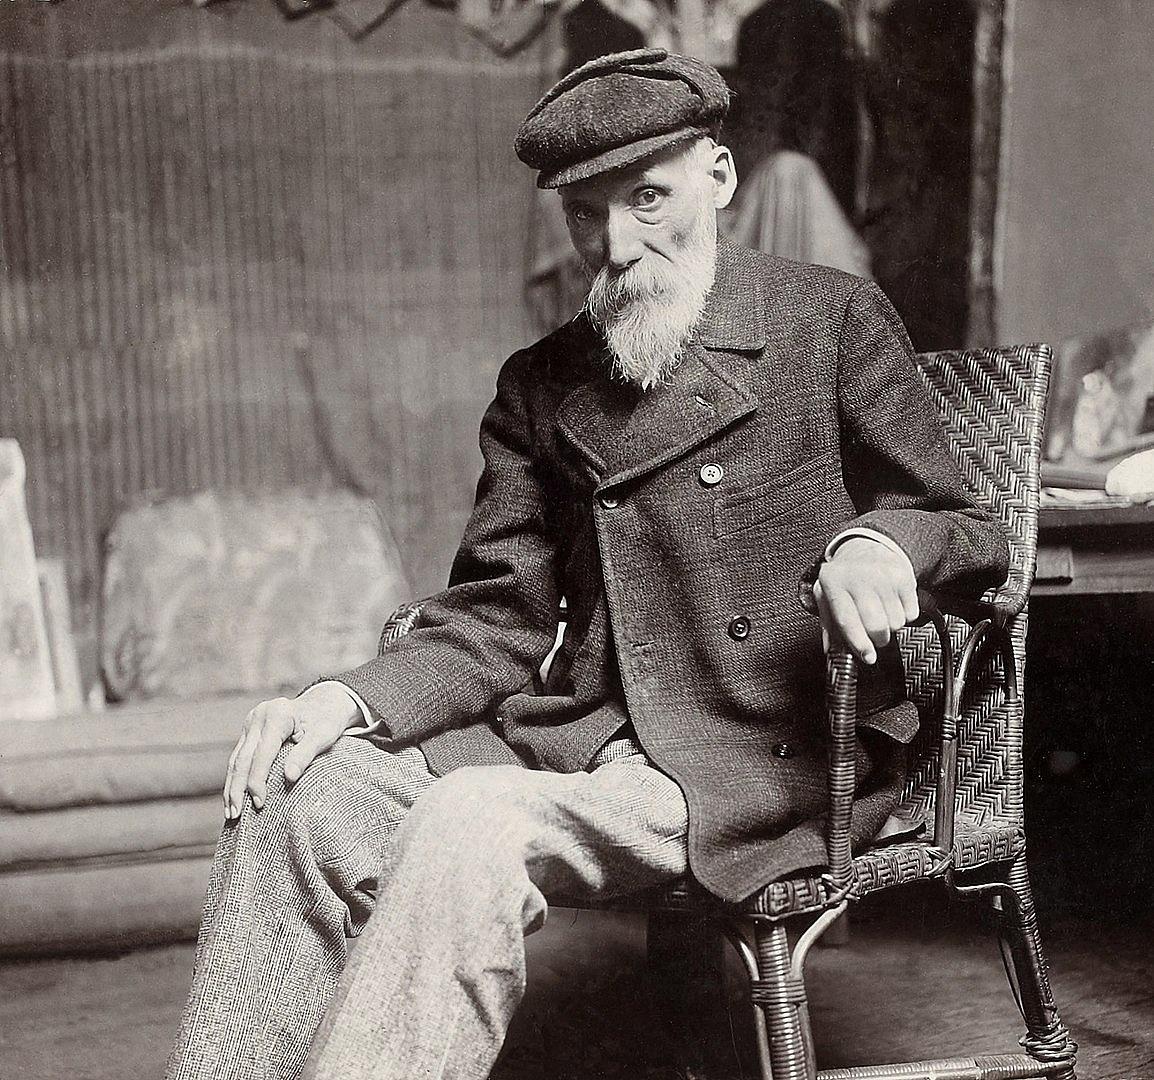 1154px-Renoir_Pierre-Auguste_by_Dornac_BNF_Gallica-103701.jpg